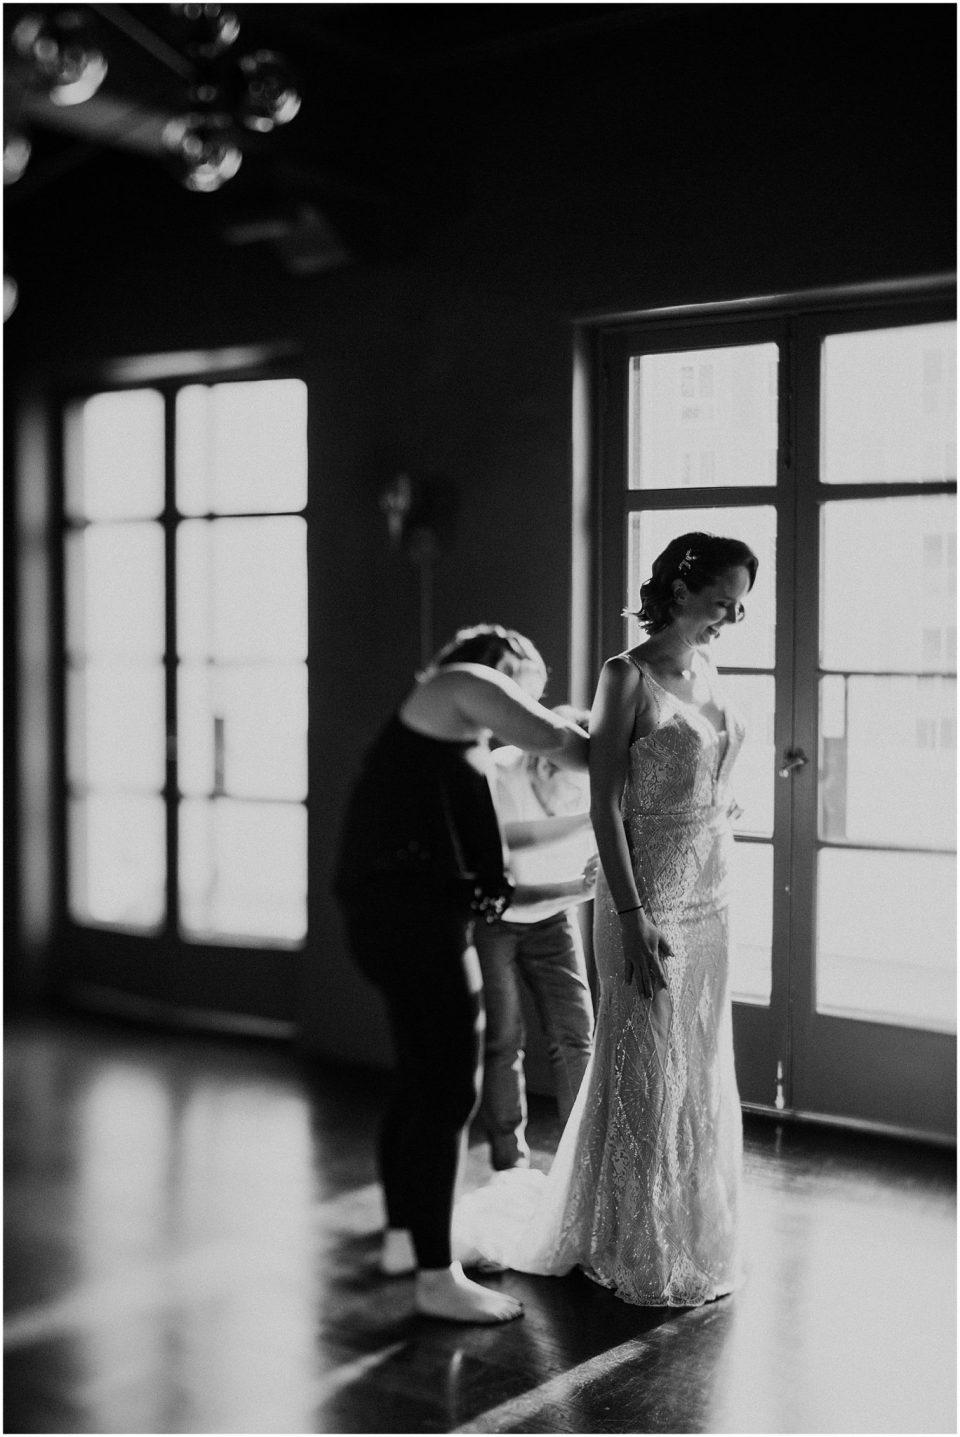 jessthony-wedding-sullivan-and-sullivan (73 of 496)_seattle wedding.jpg